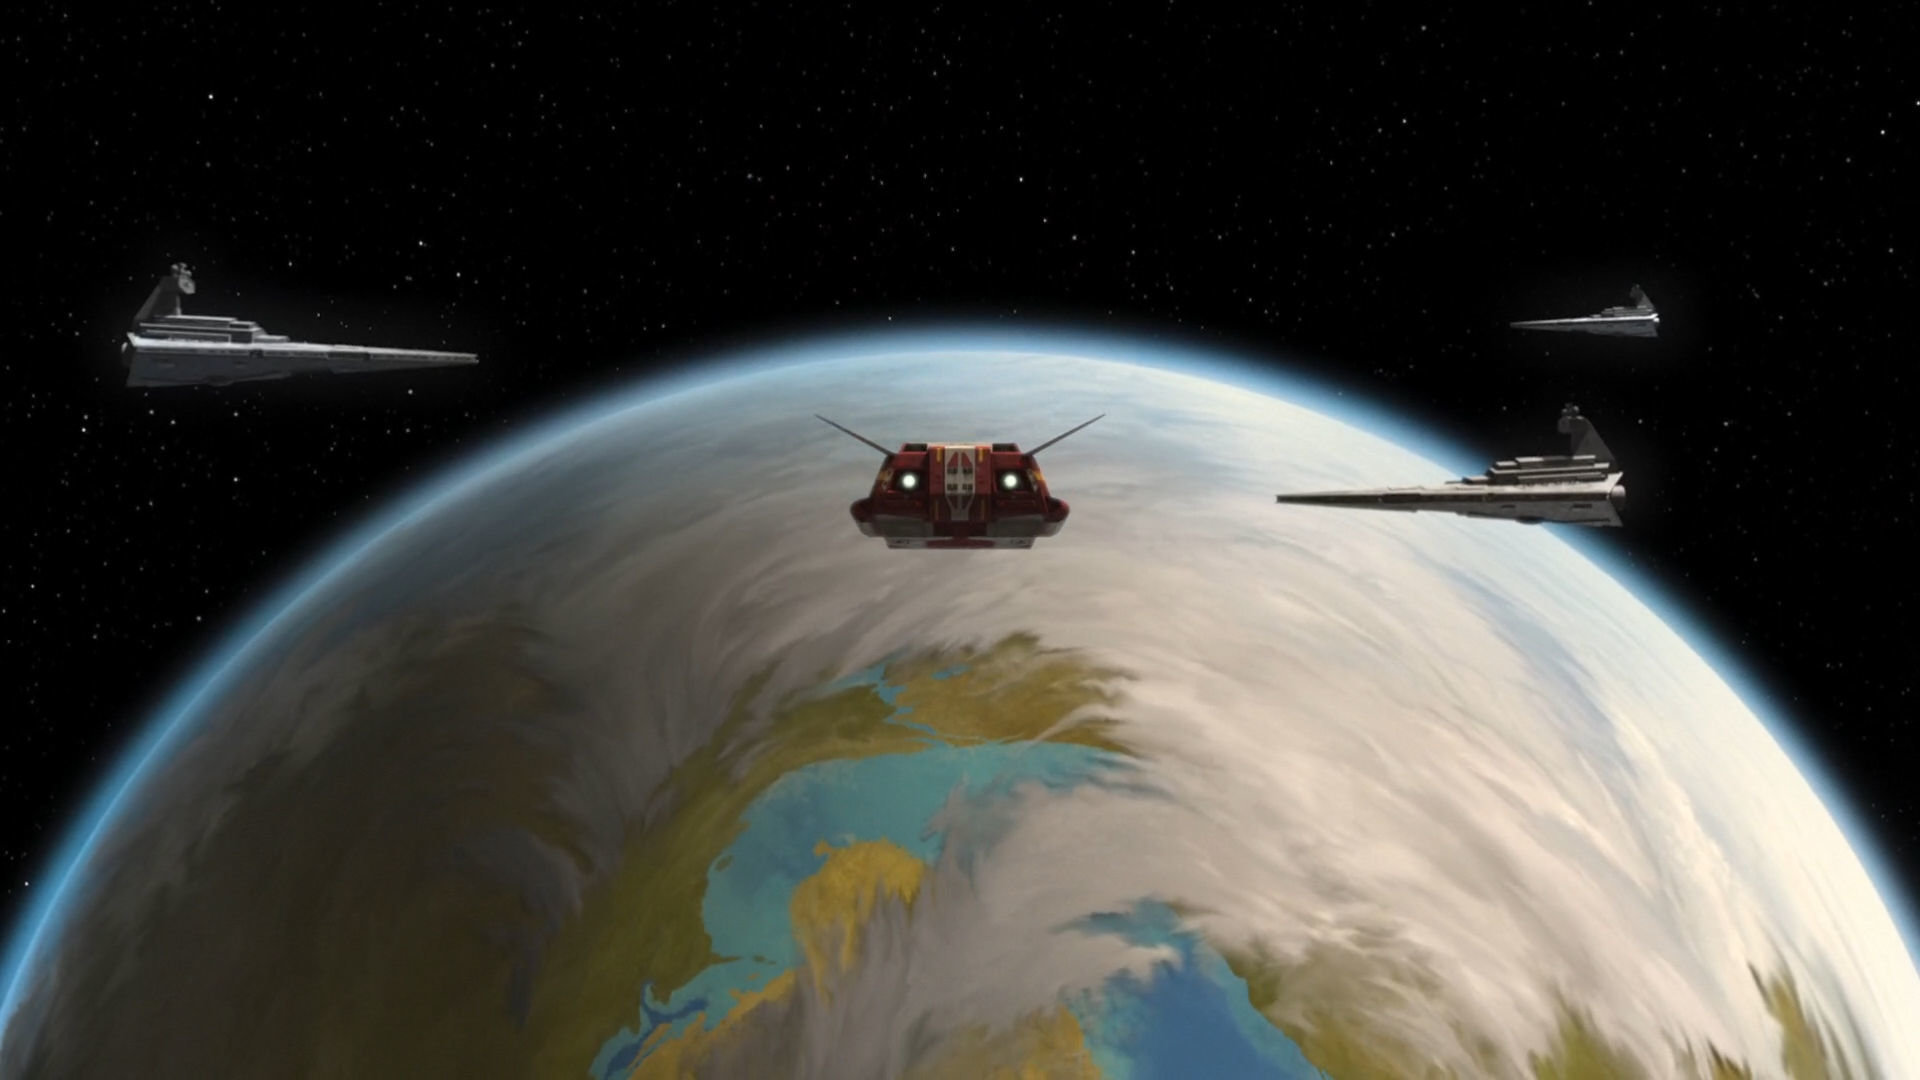 High Resolution Star Wars Rebels Full Hd Wallpaper Id456117 For Desktop